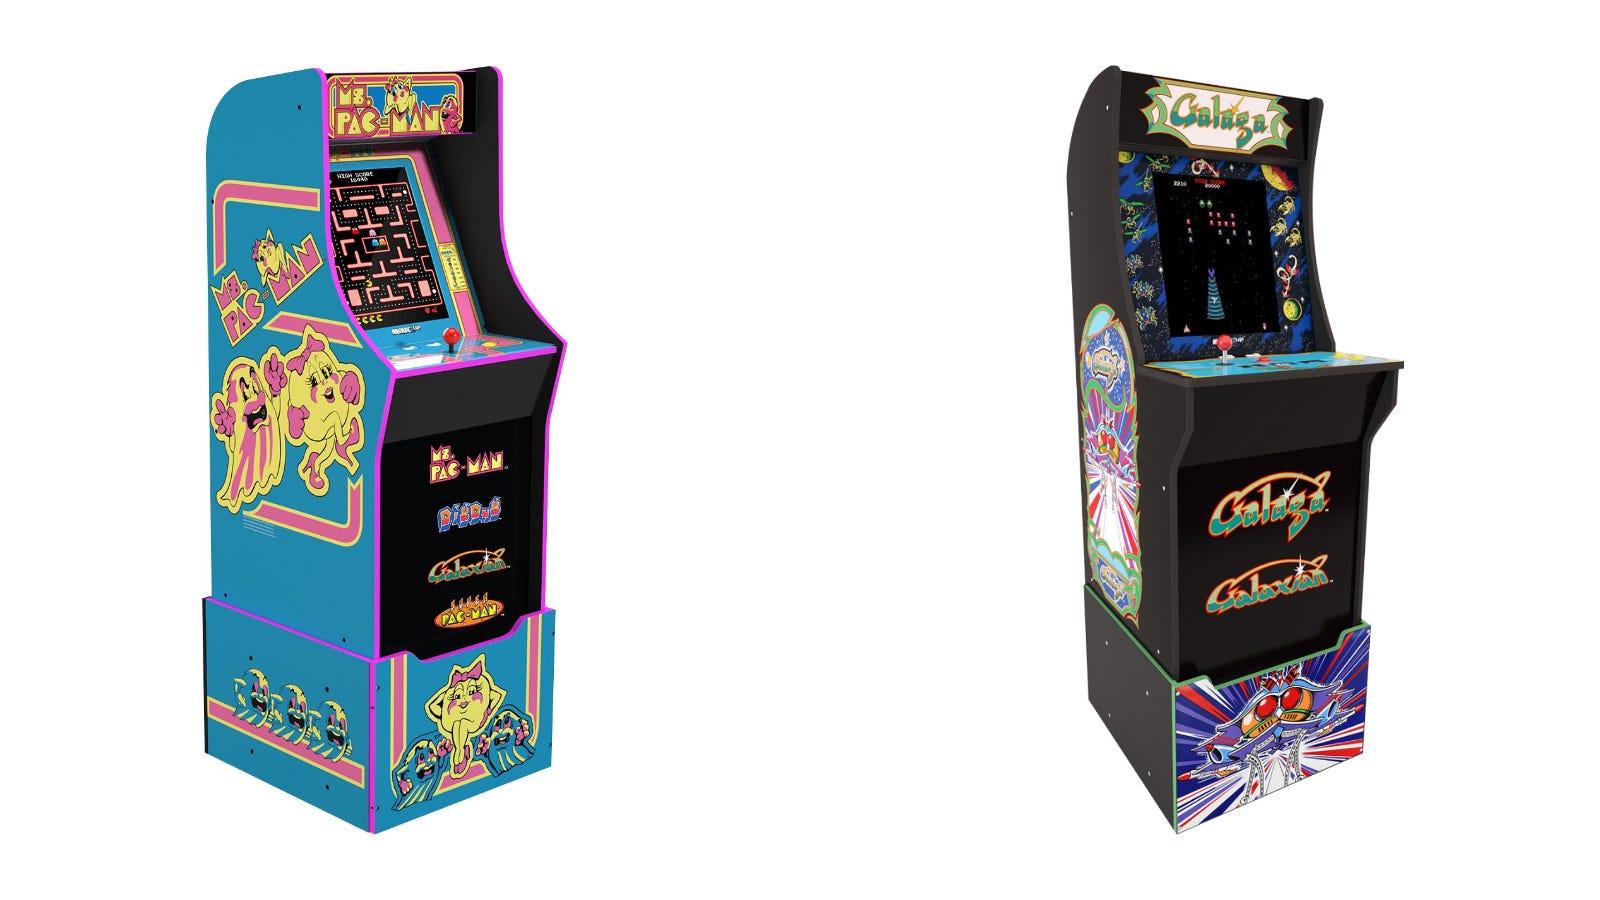 Ms. Pac-Man and Galaga Arcade1Up Cabinets